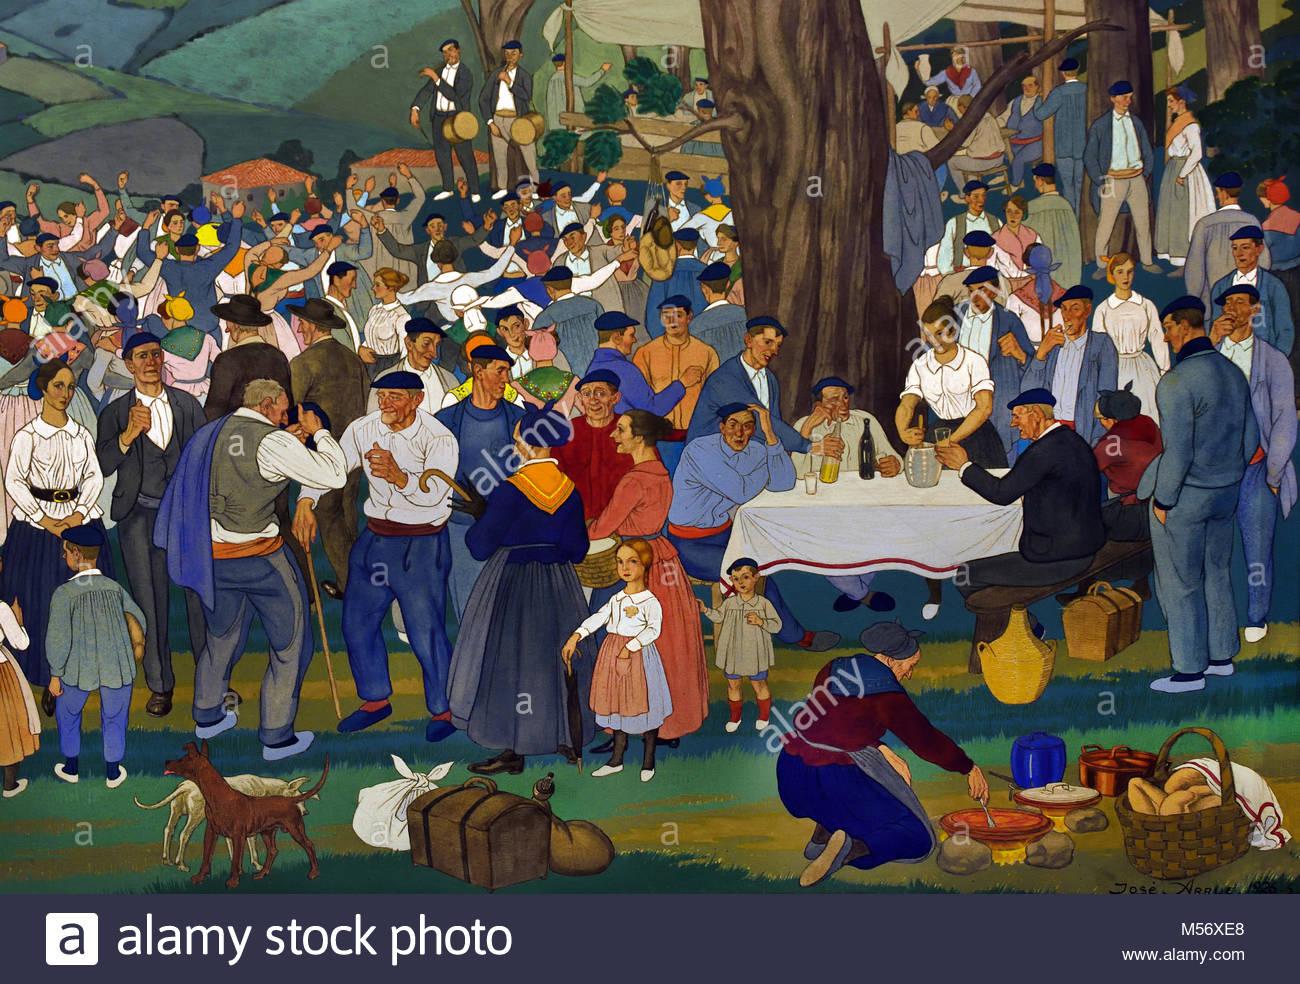 Local Fiesta 1926 Jose Arrue, 1885-1977, 20th century, Bilbao, Spanish,Spain. - Stock Image